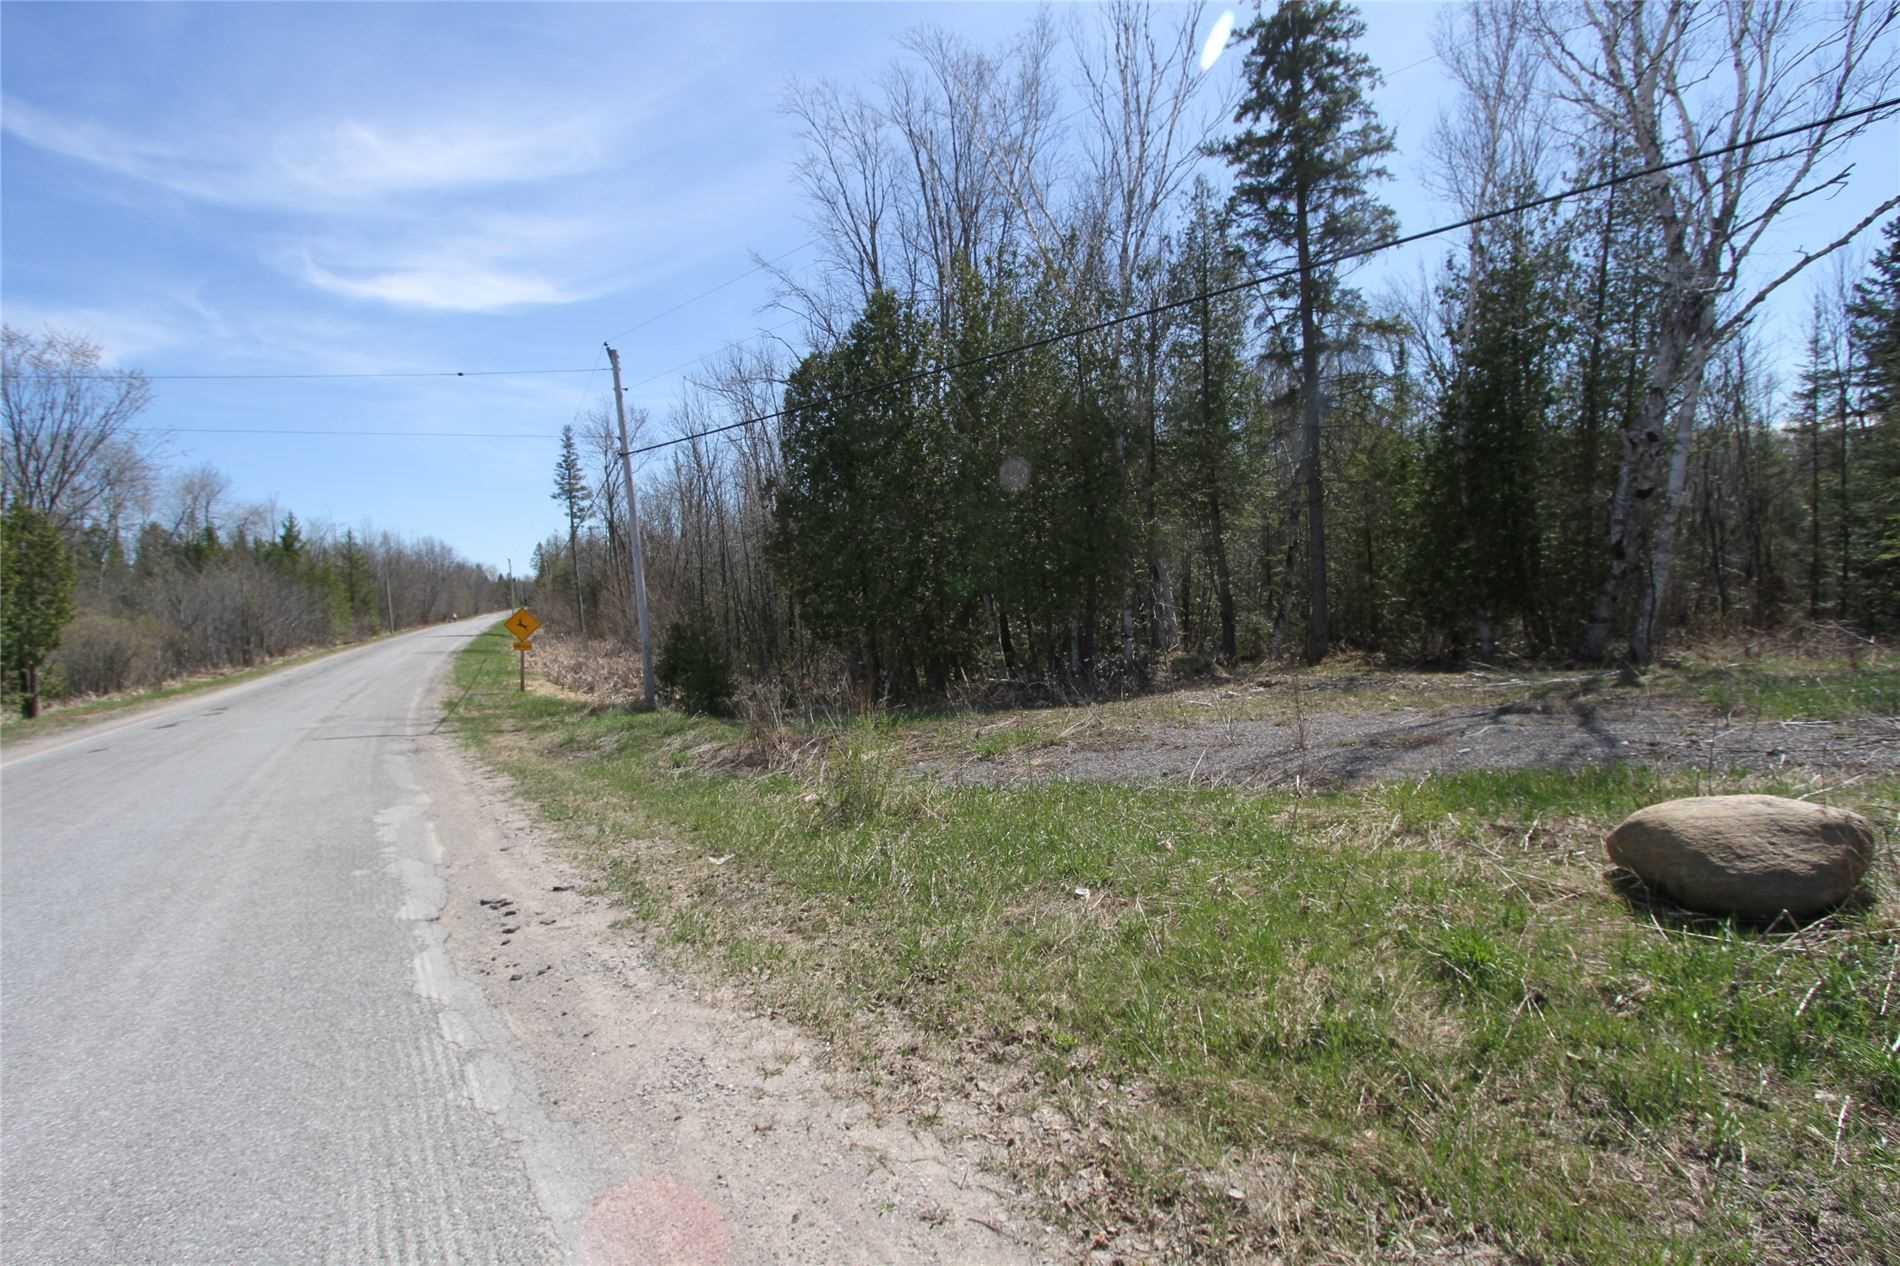 259 County Rd 41 Rd, Kawartha Lakes Ontario, Canada